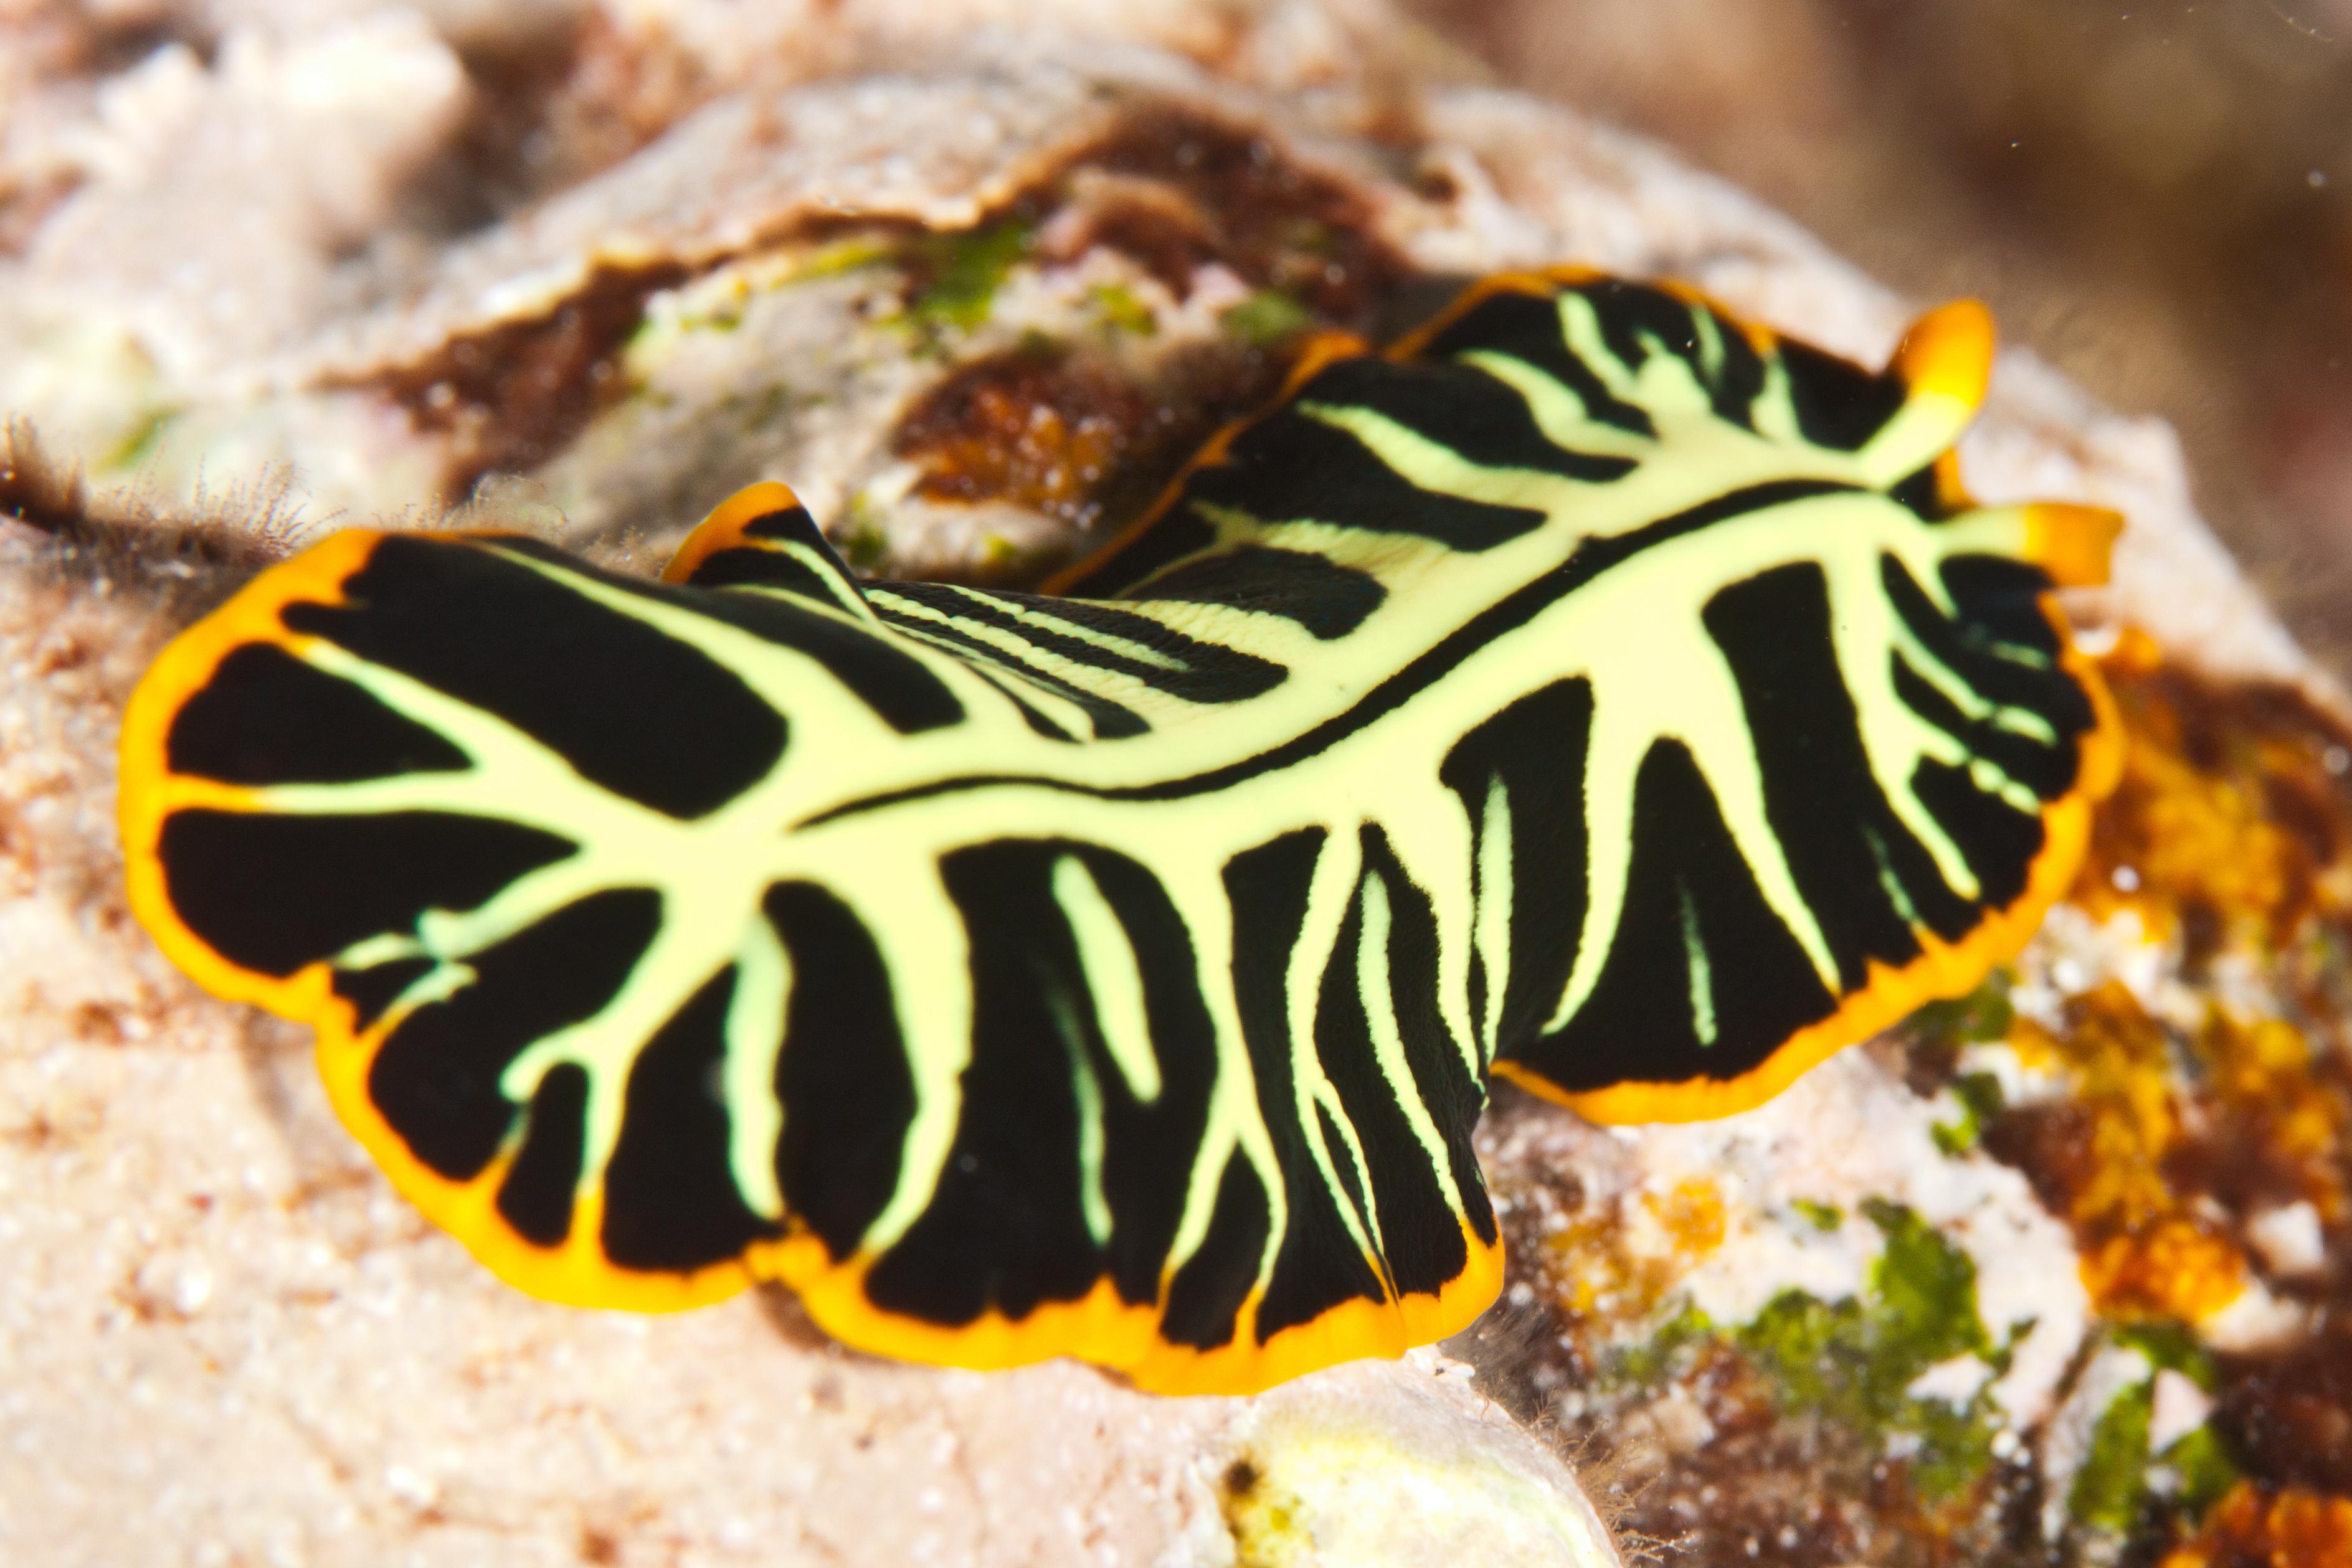 platyhelminthes un singur amfibian